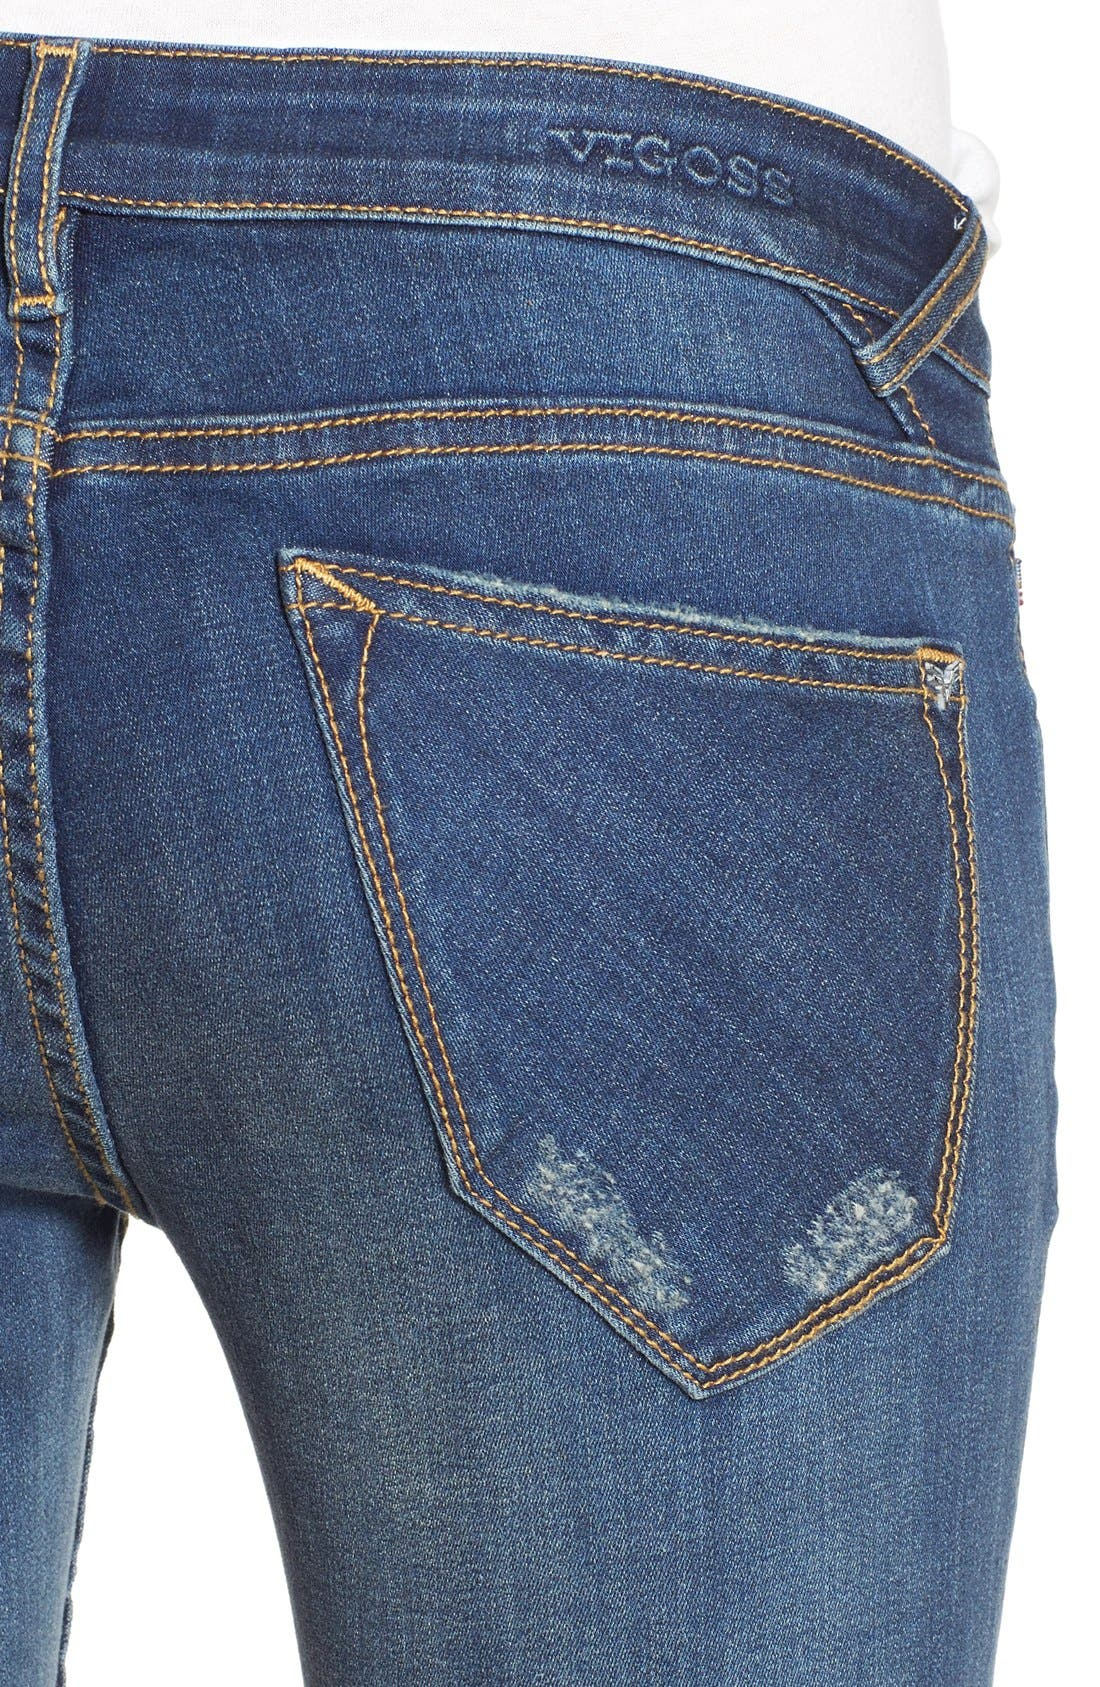 'Thompson' Distressed Skinny Jeans,                             Alternate thumbnail 2, color,